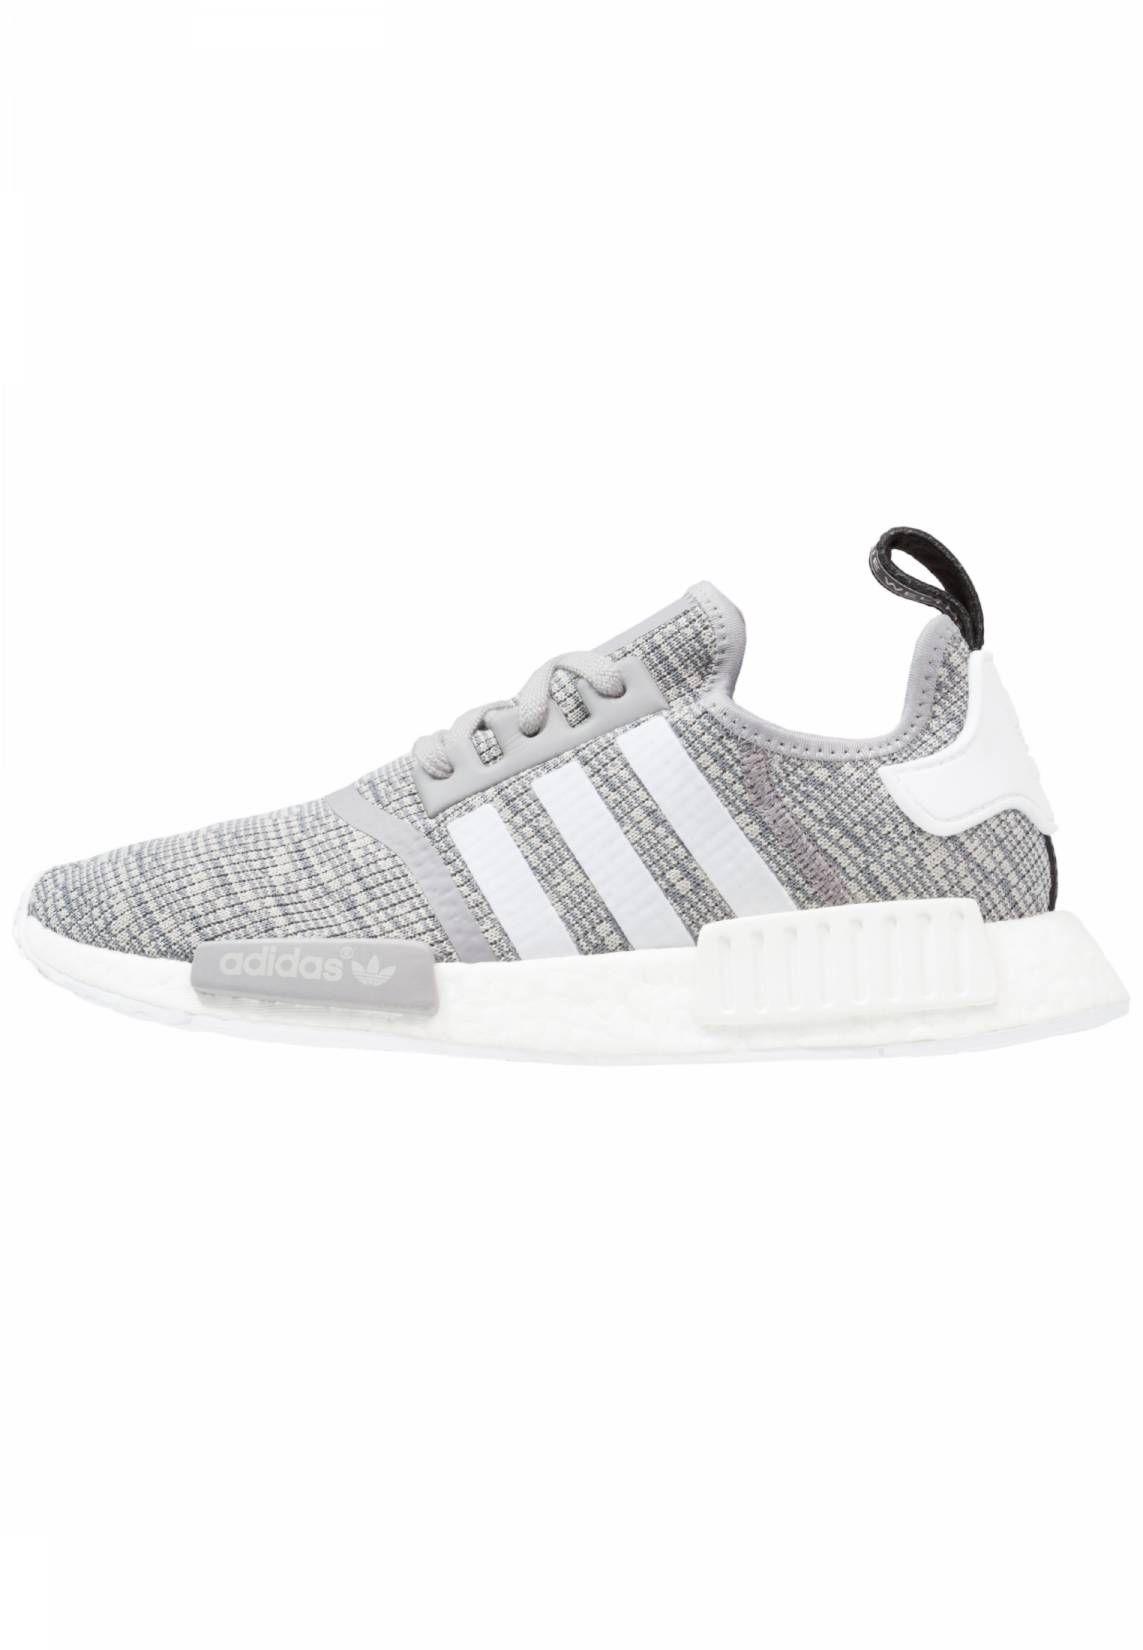 Adidas Trainers Pattern Solid r1 Greywhite Nmd marl Originals HHFv1